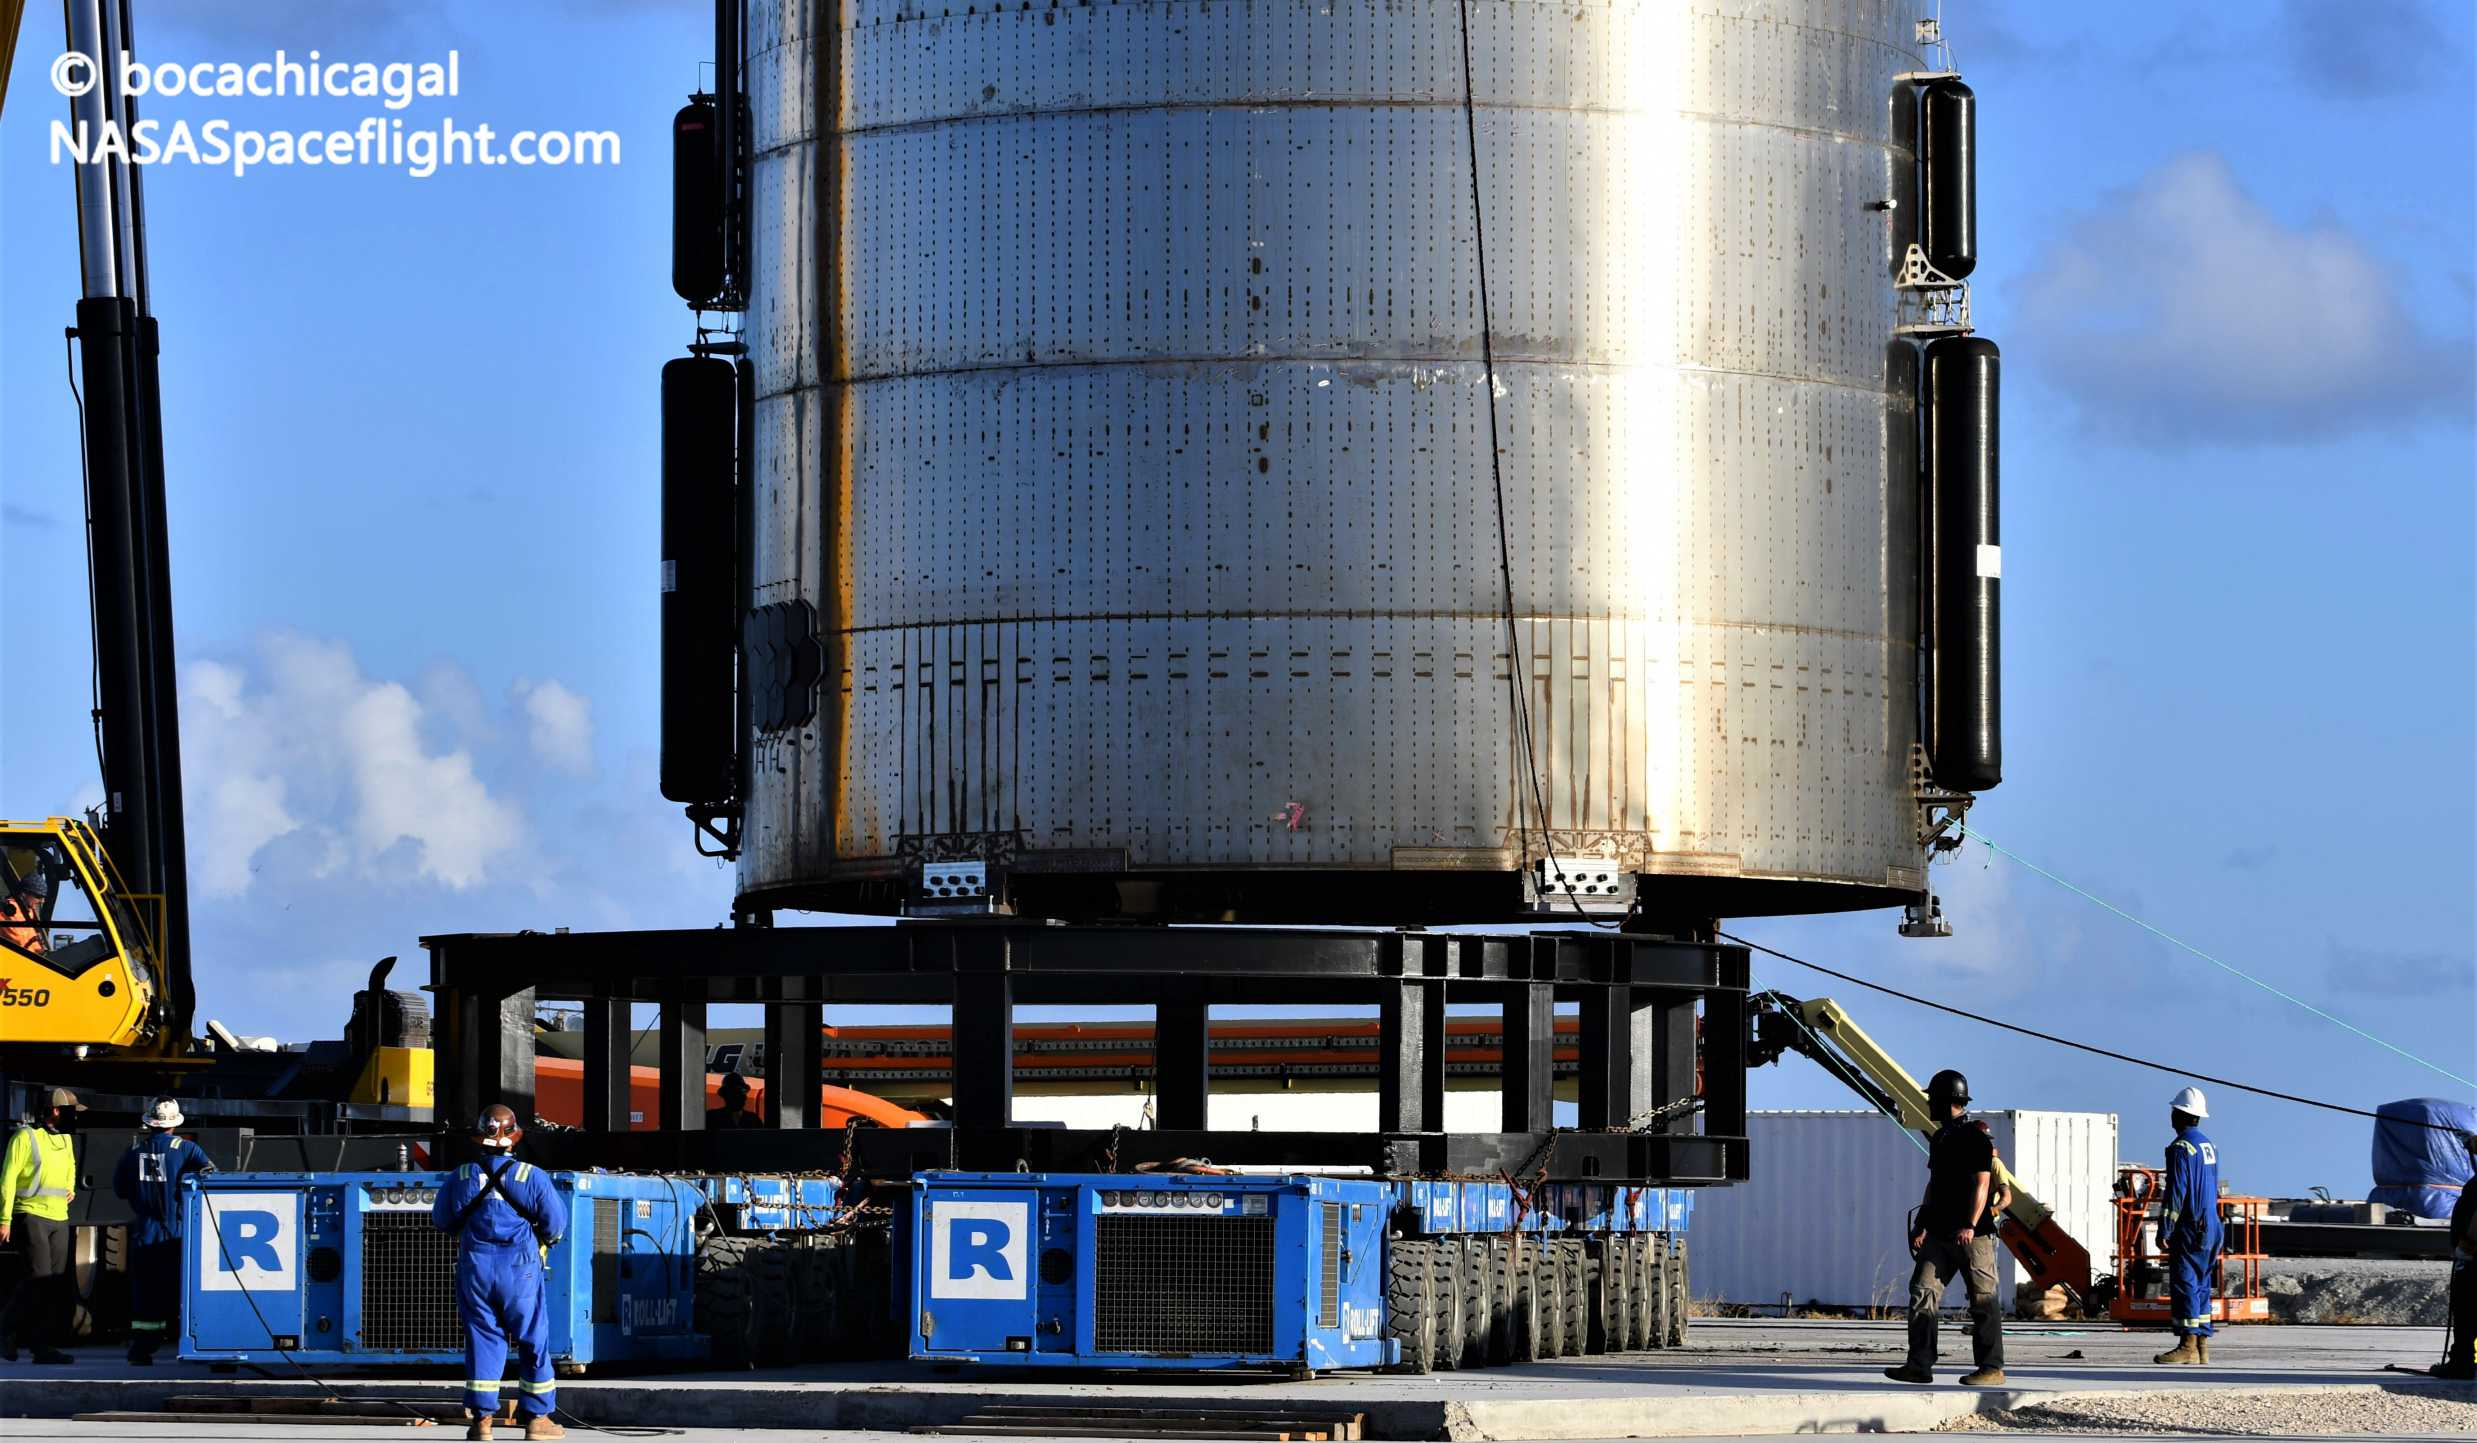 Starship Boca Chica 080720 (NASASpaceflight – bocachicagal) SN5 lift 2 crop (c)